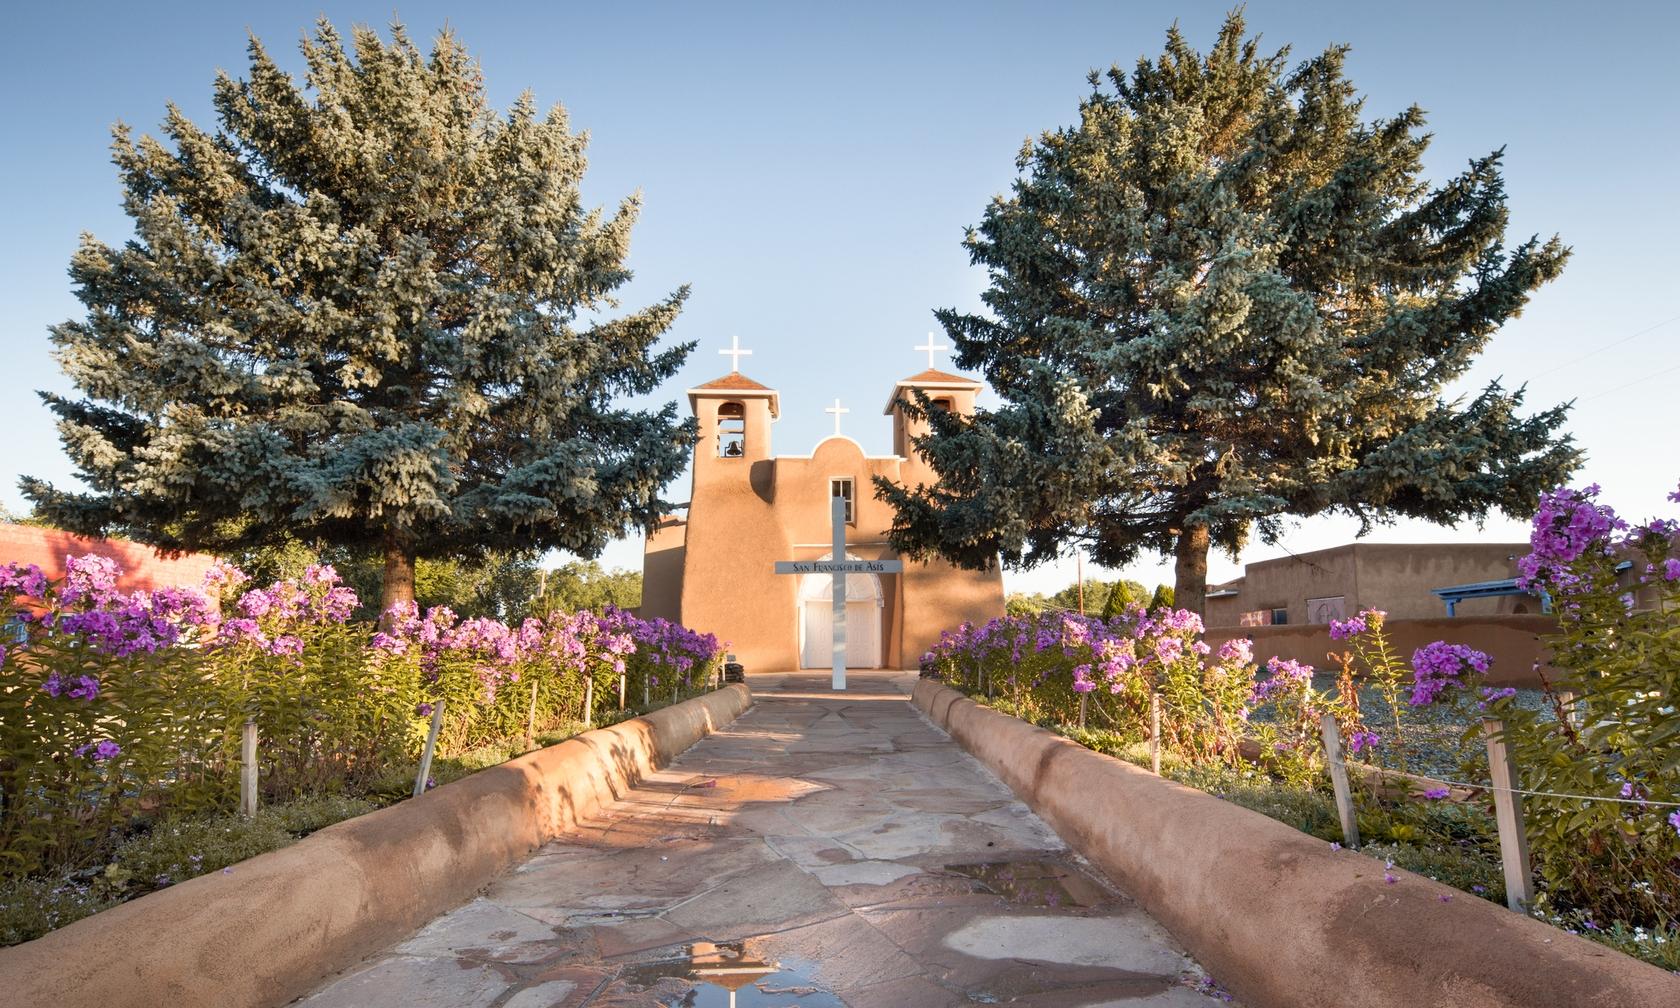 Vacation rentals in Taos